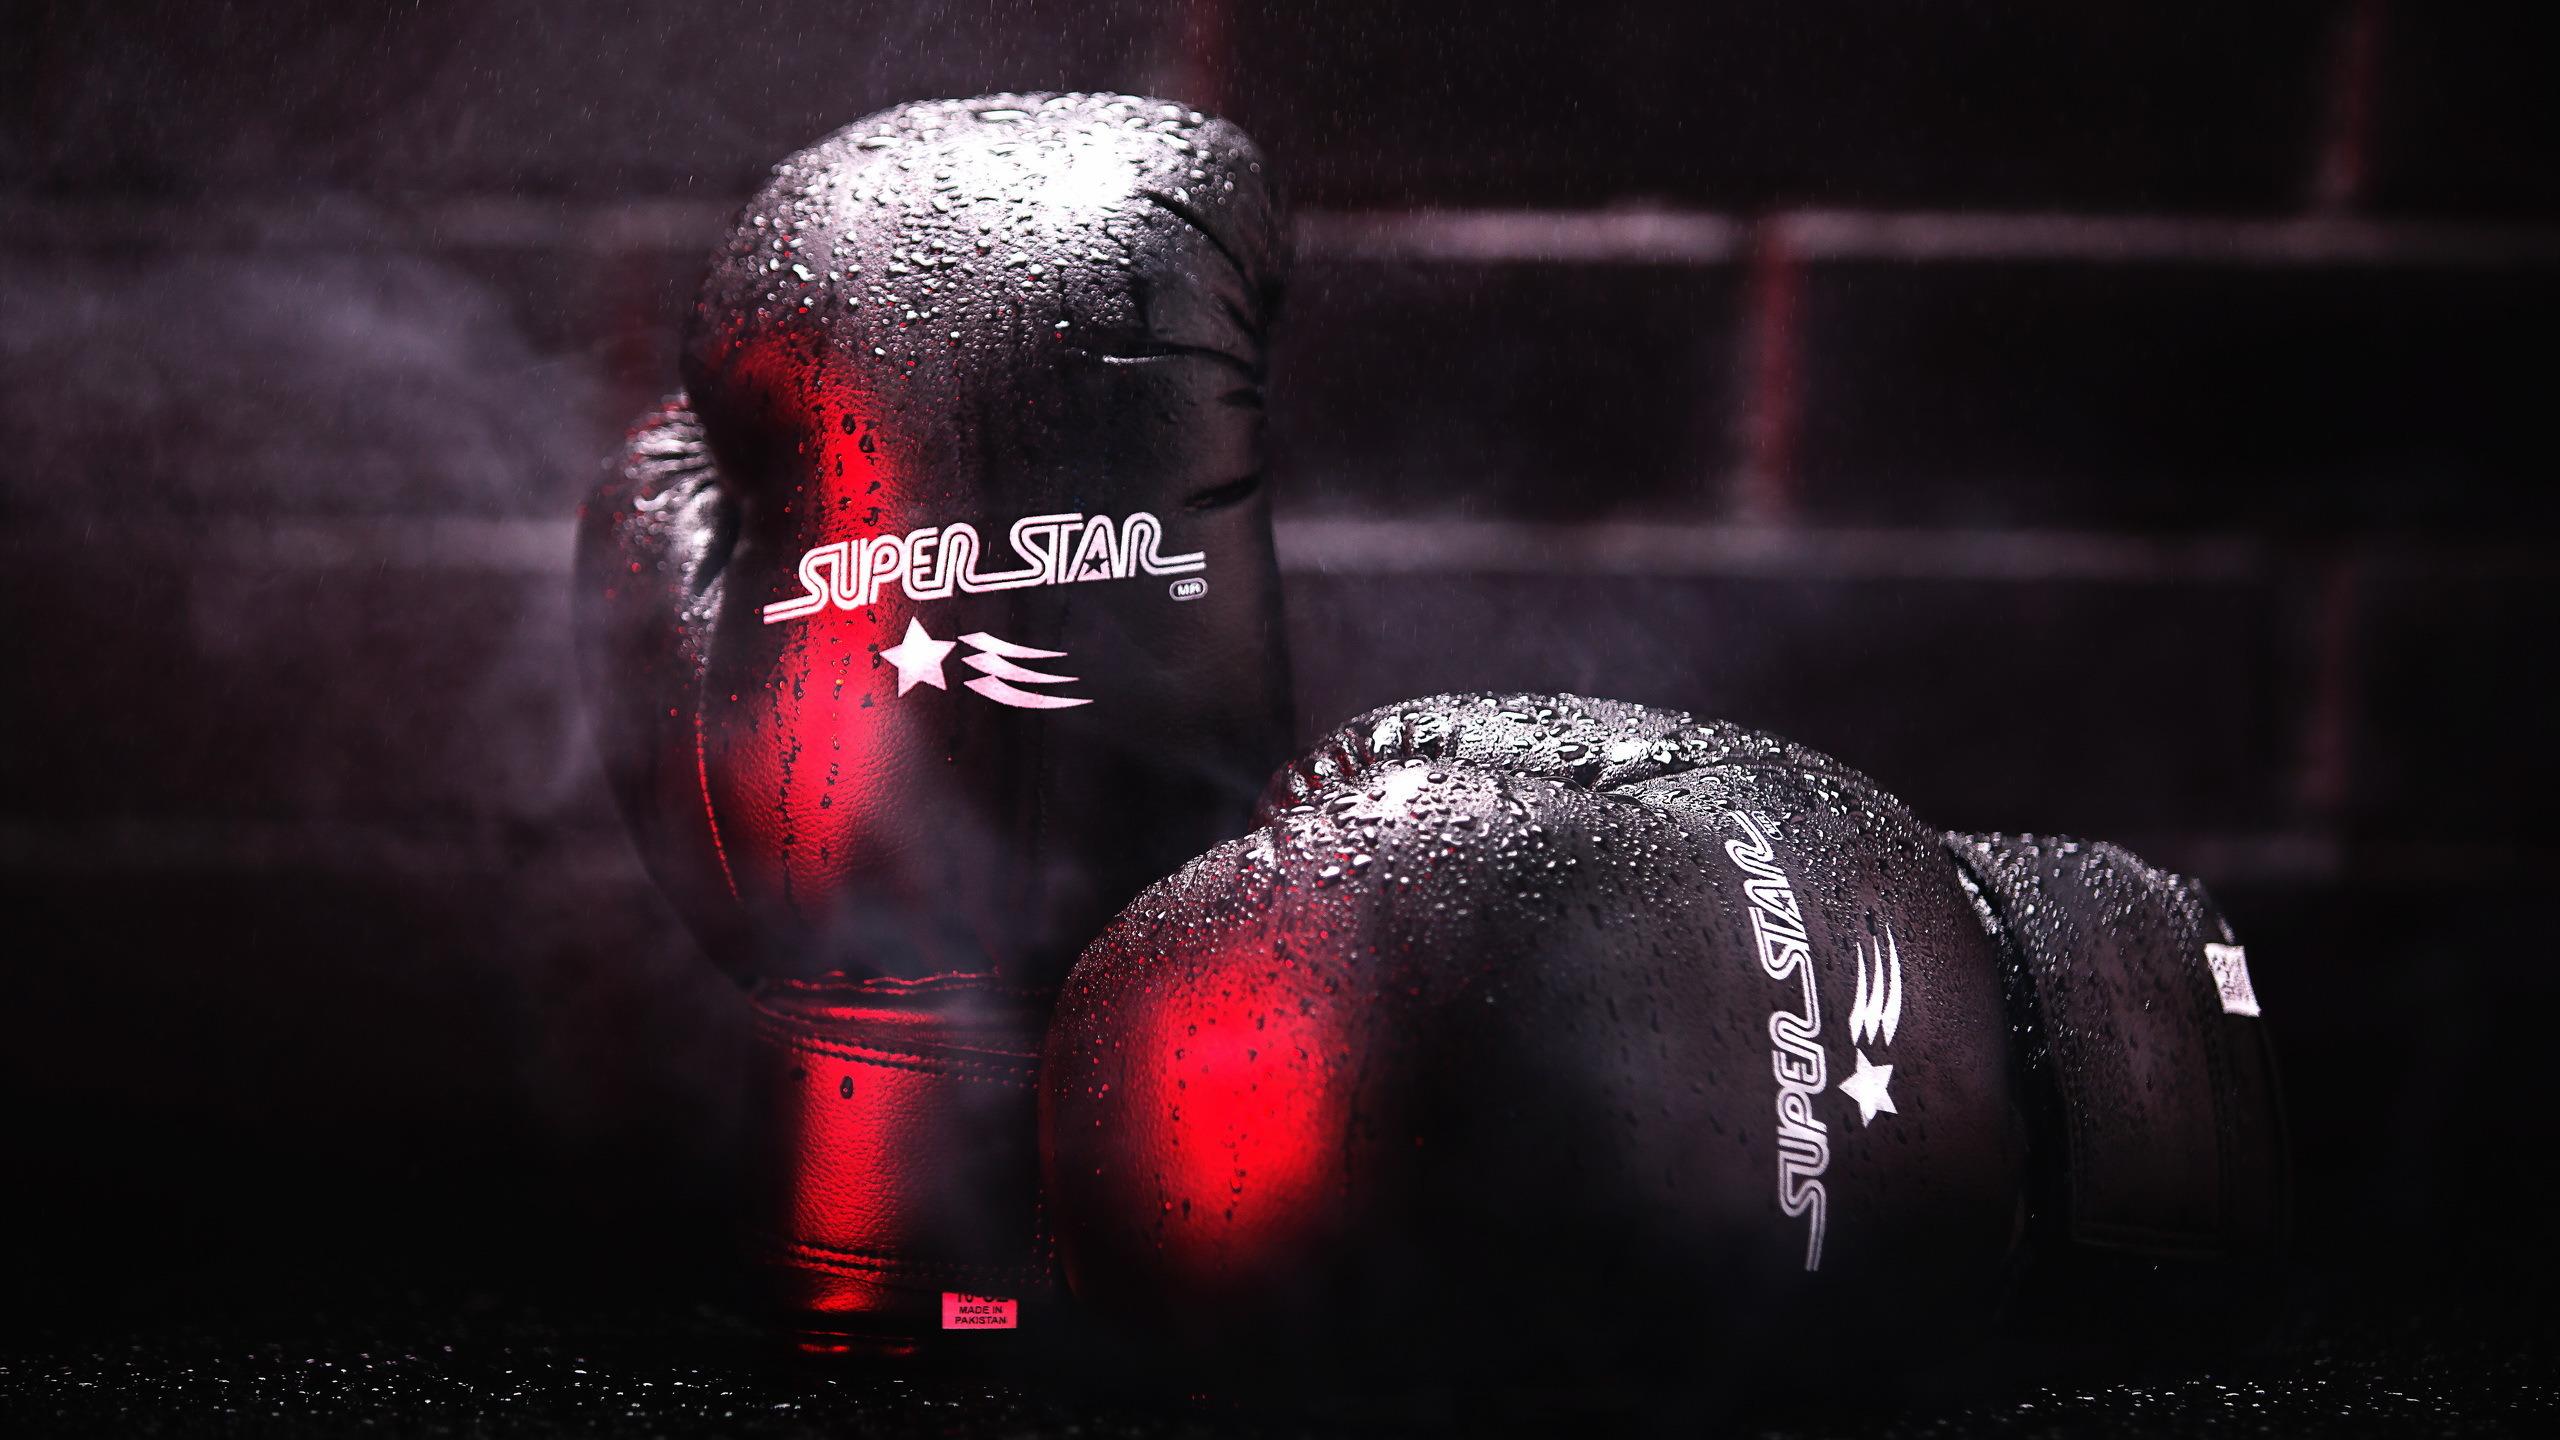 картинки с боксерской темой макулы